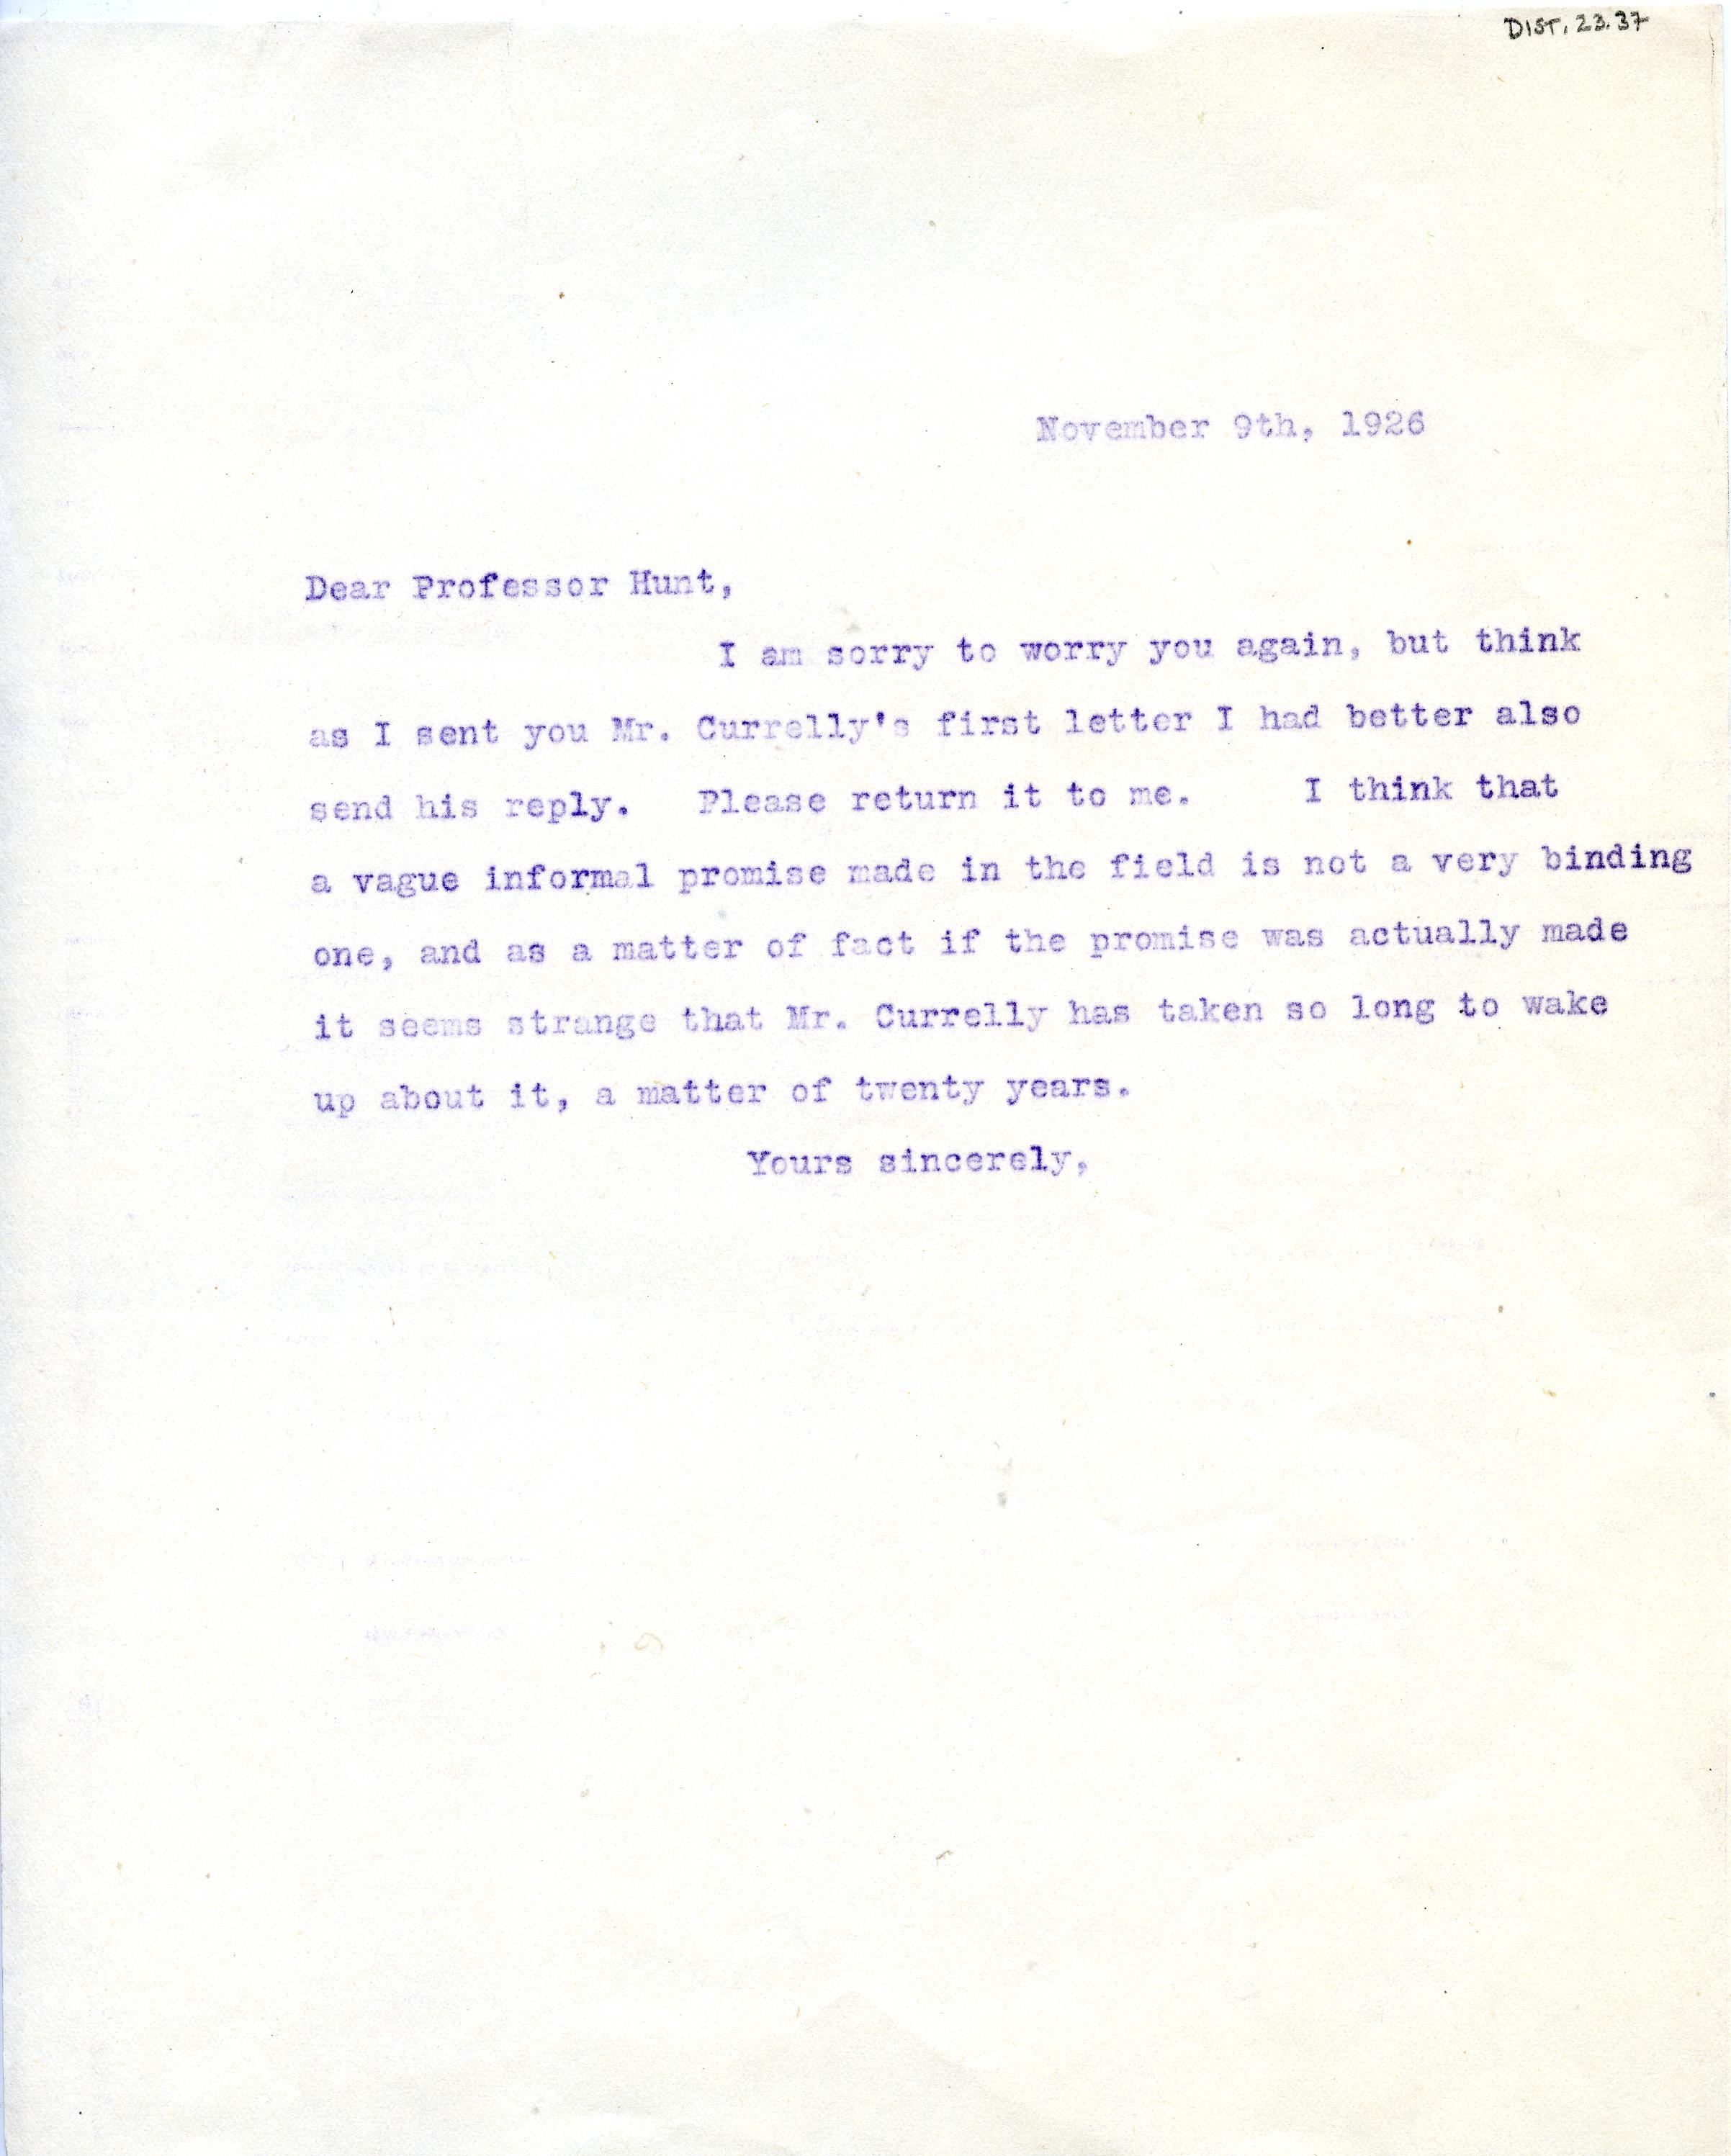 1904-05 Sinai, Deir el-Bahri, Oxyrhynchus, Naukratis DIST.23.37